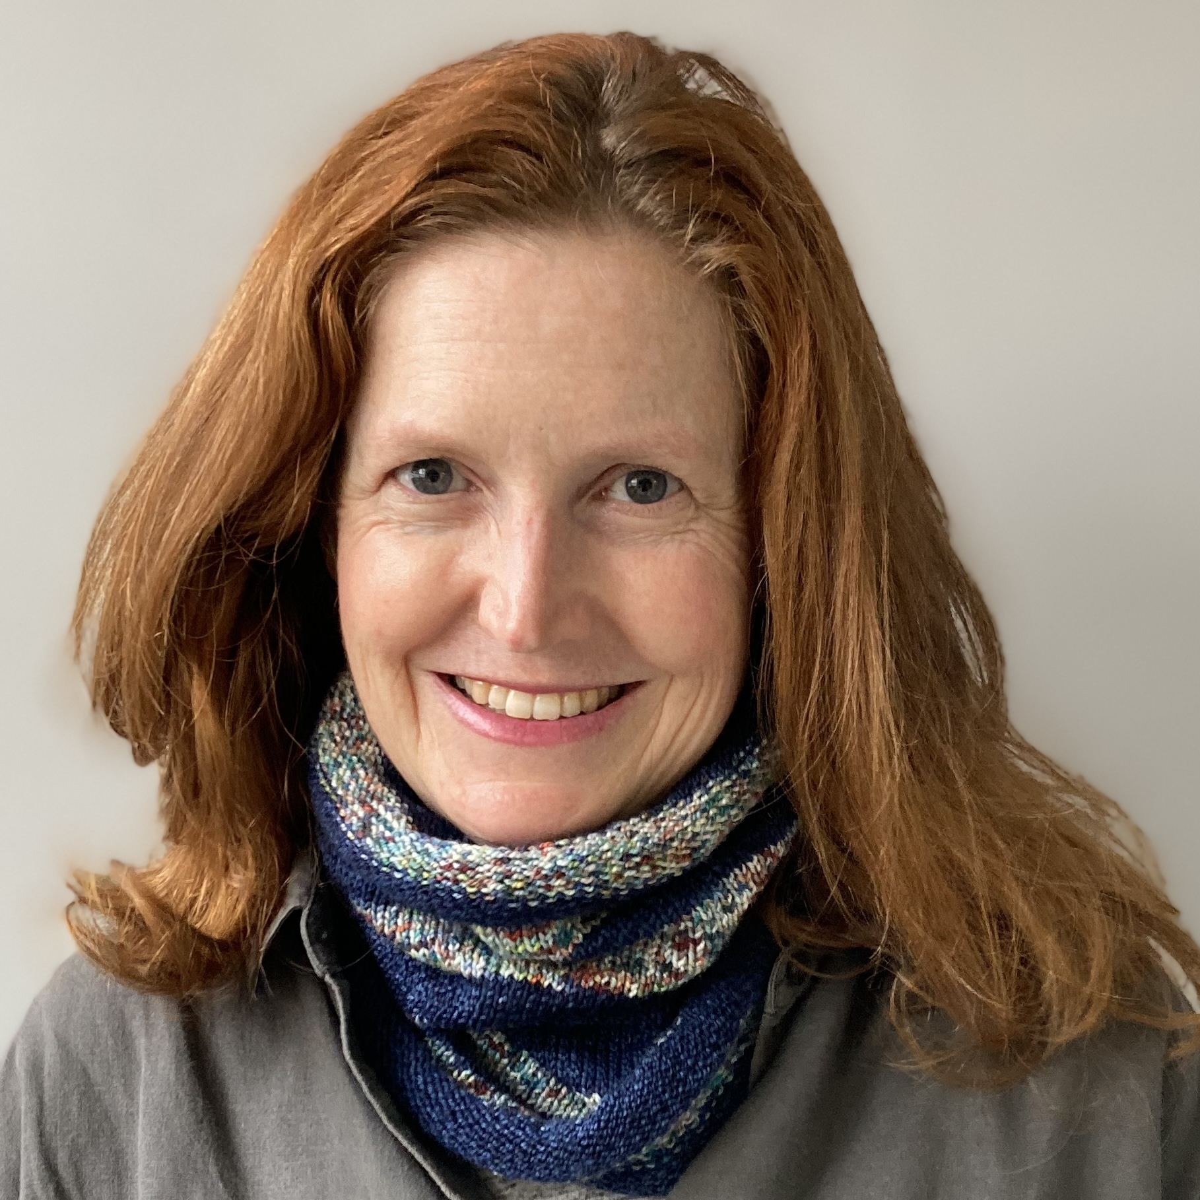 Bridget Henderson wears a hand knit neckwarmer in Cowgirlblues Merino Twist Indigo Stripe colourway